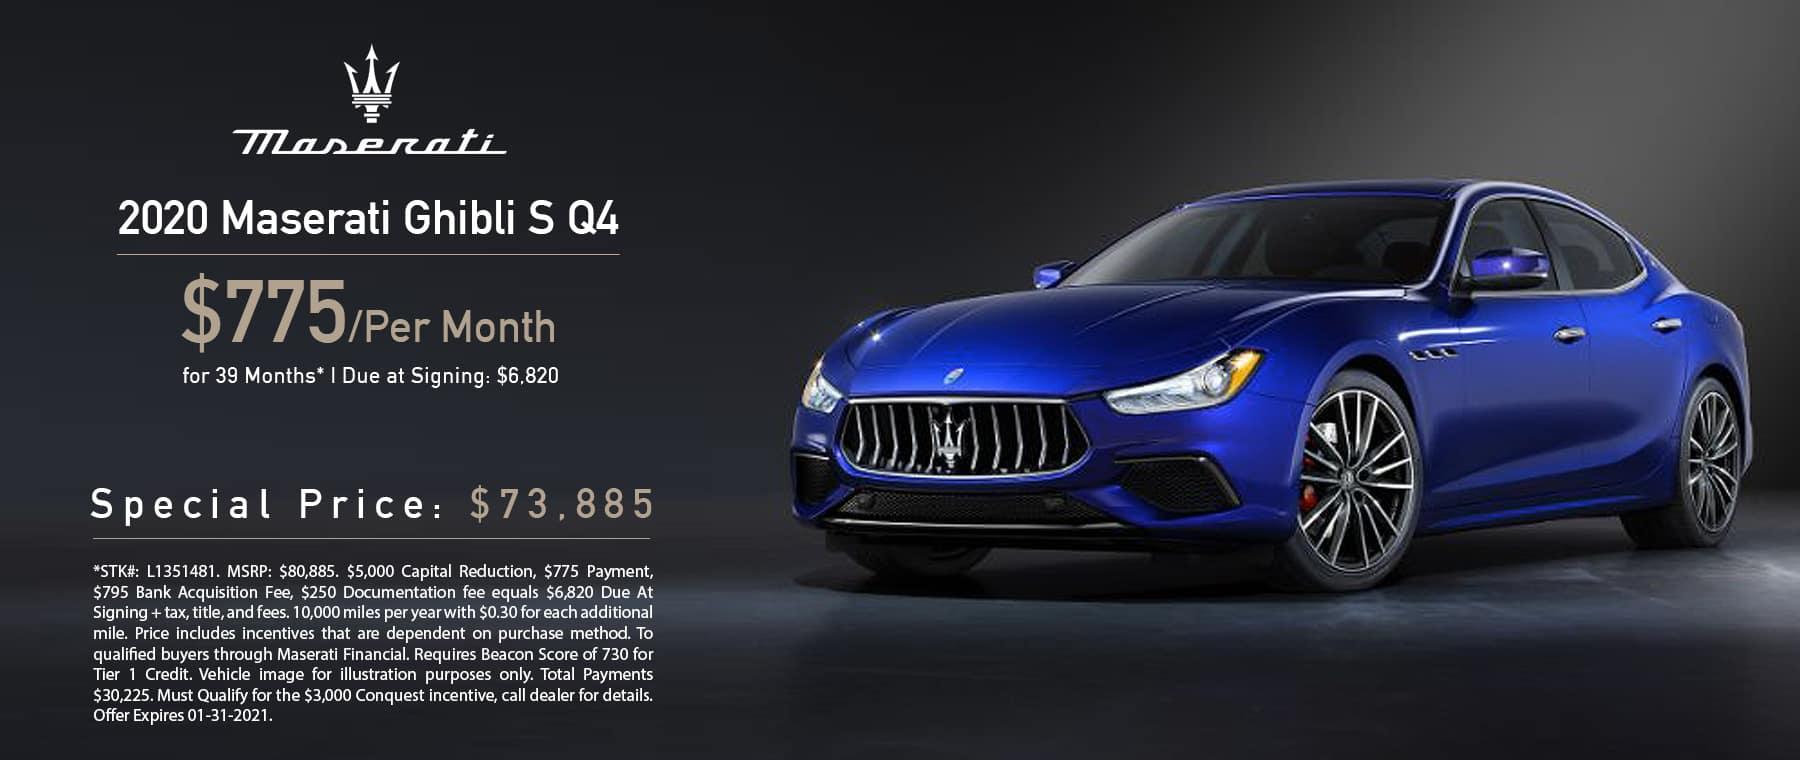 Maserati_2020_Ghibli_Slide_Jan2021_1